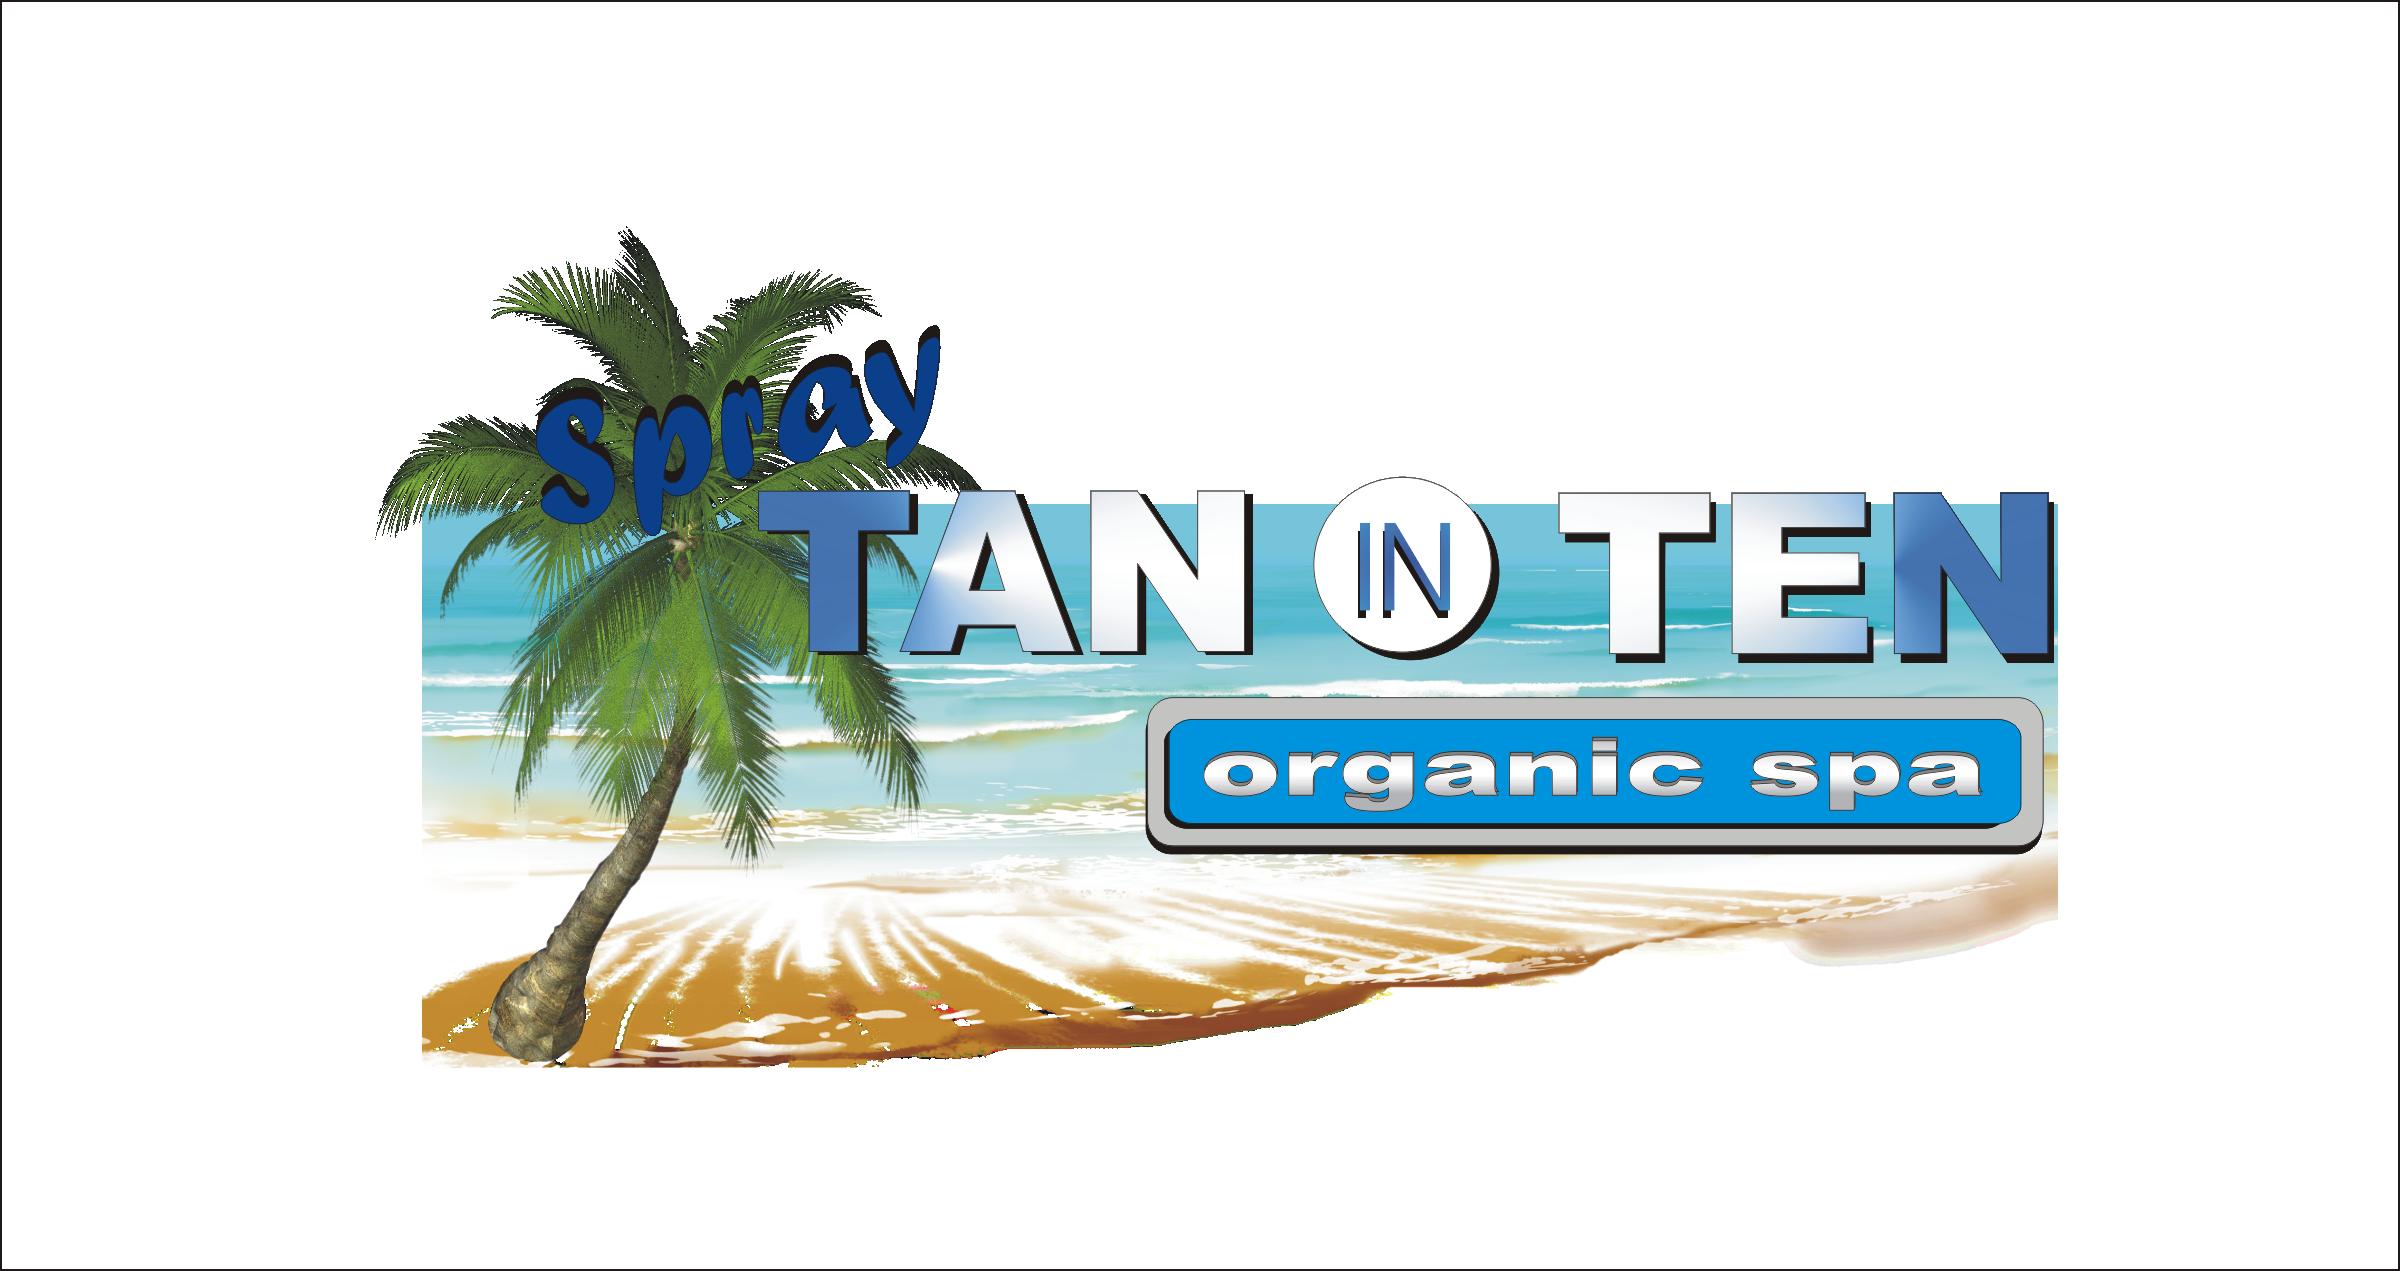 Spray TAN in TEN